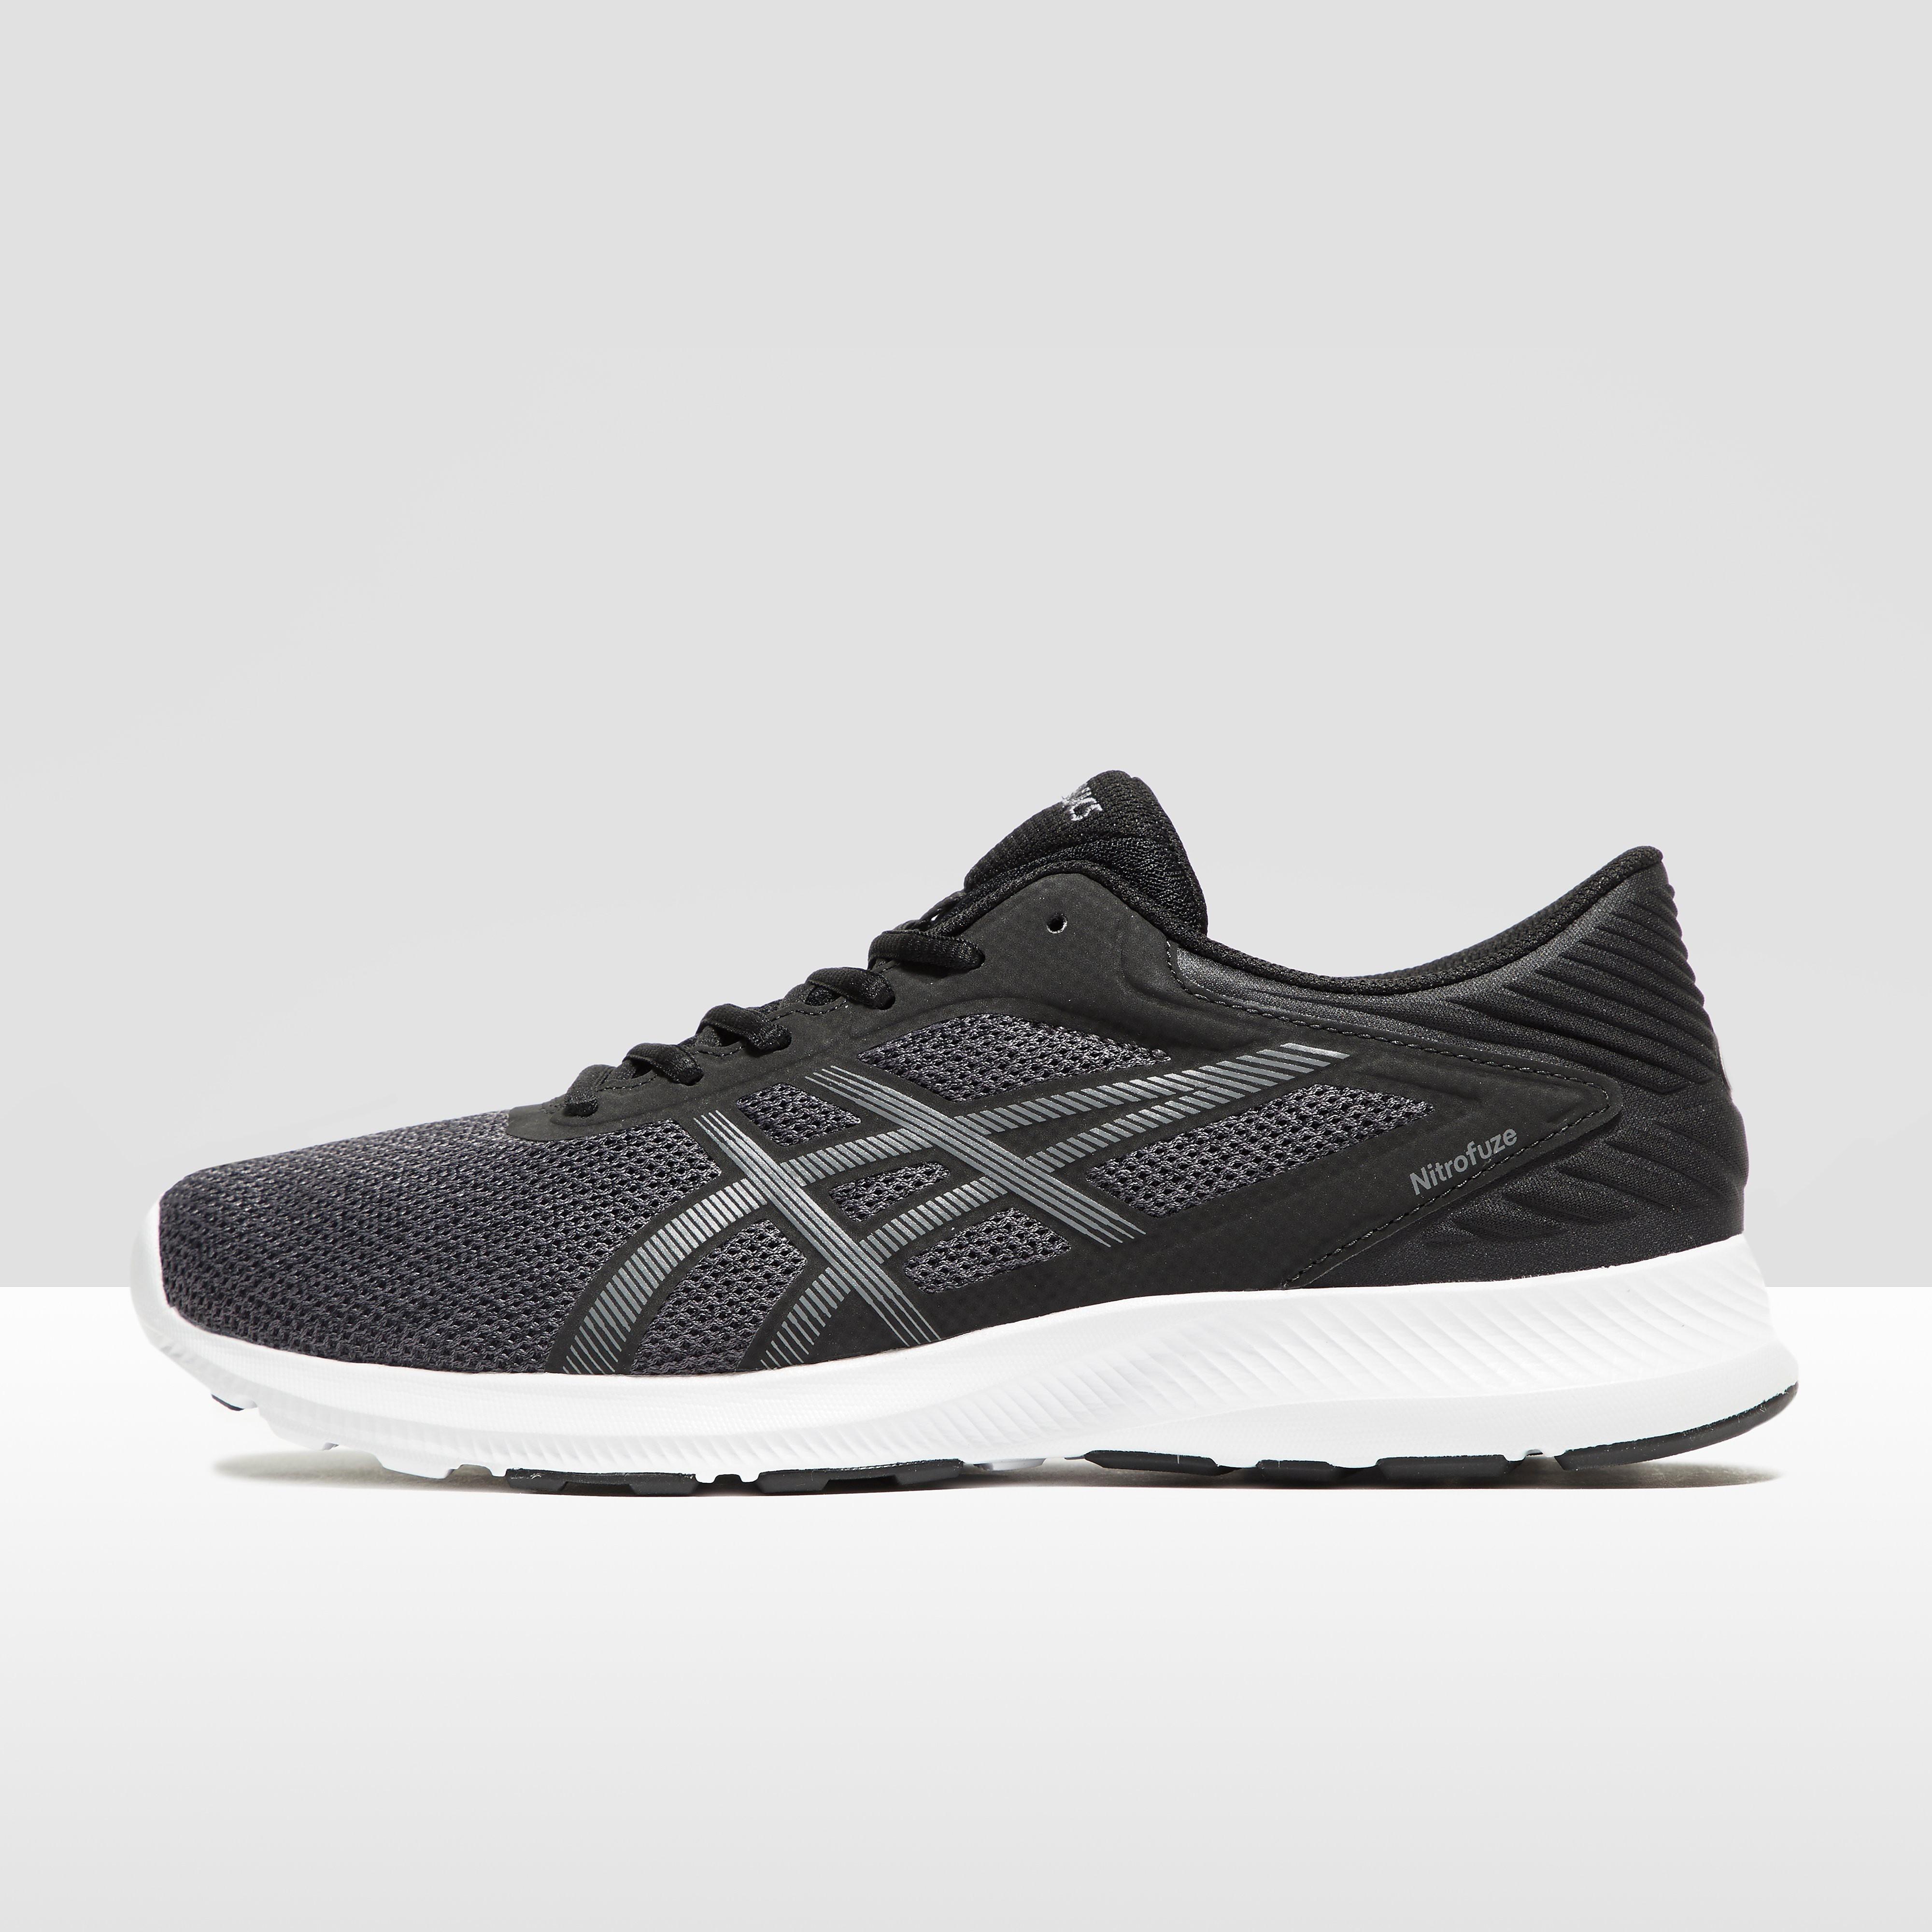 ASICS Nitro Fuze Men's Running Shoes